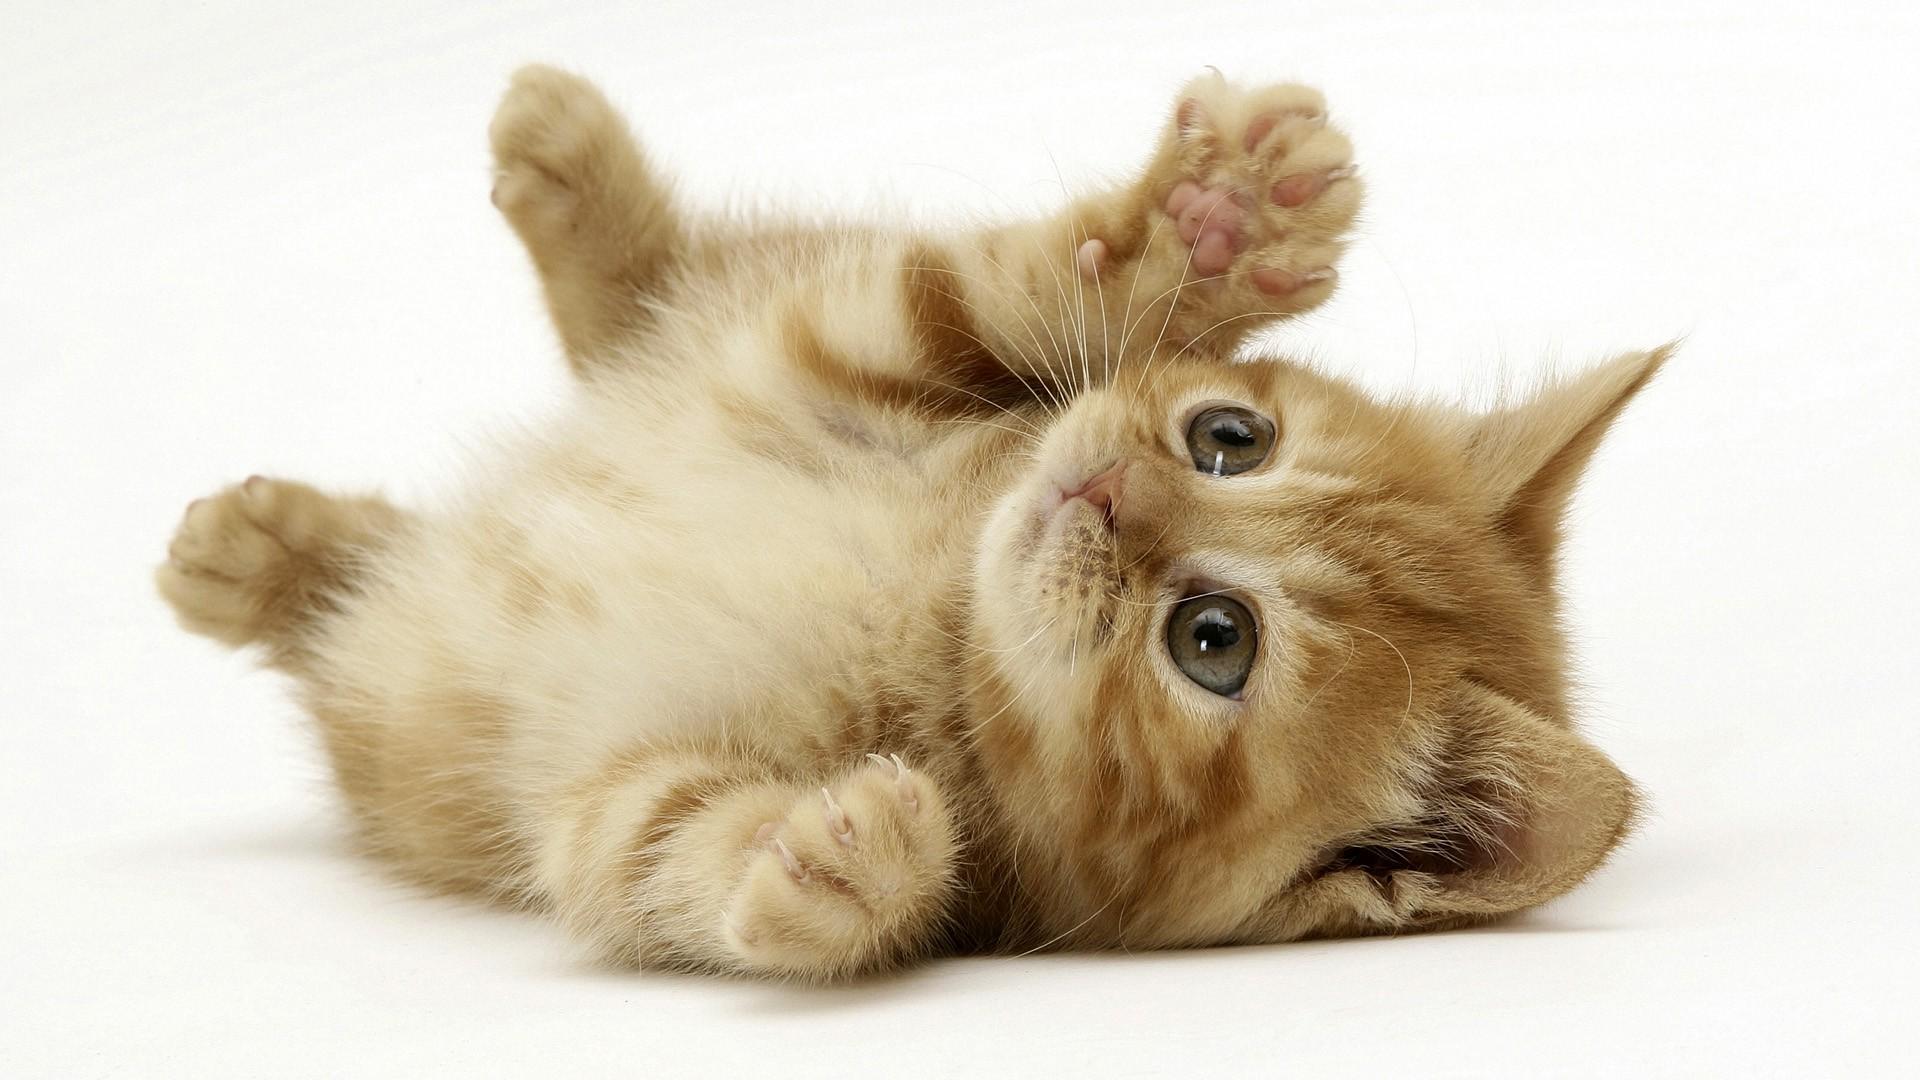 Fondos De Pantalla De Animales Bebes: Fondos De Pantalla : Gato, Animales, Fondo Blanco, Nariz